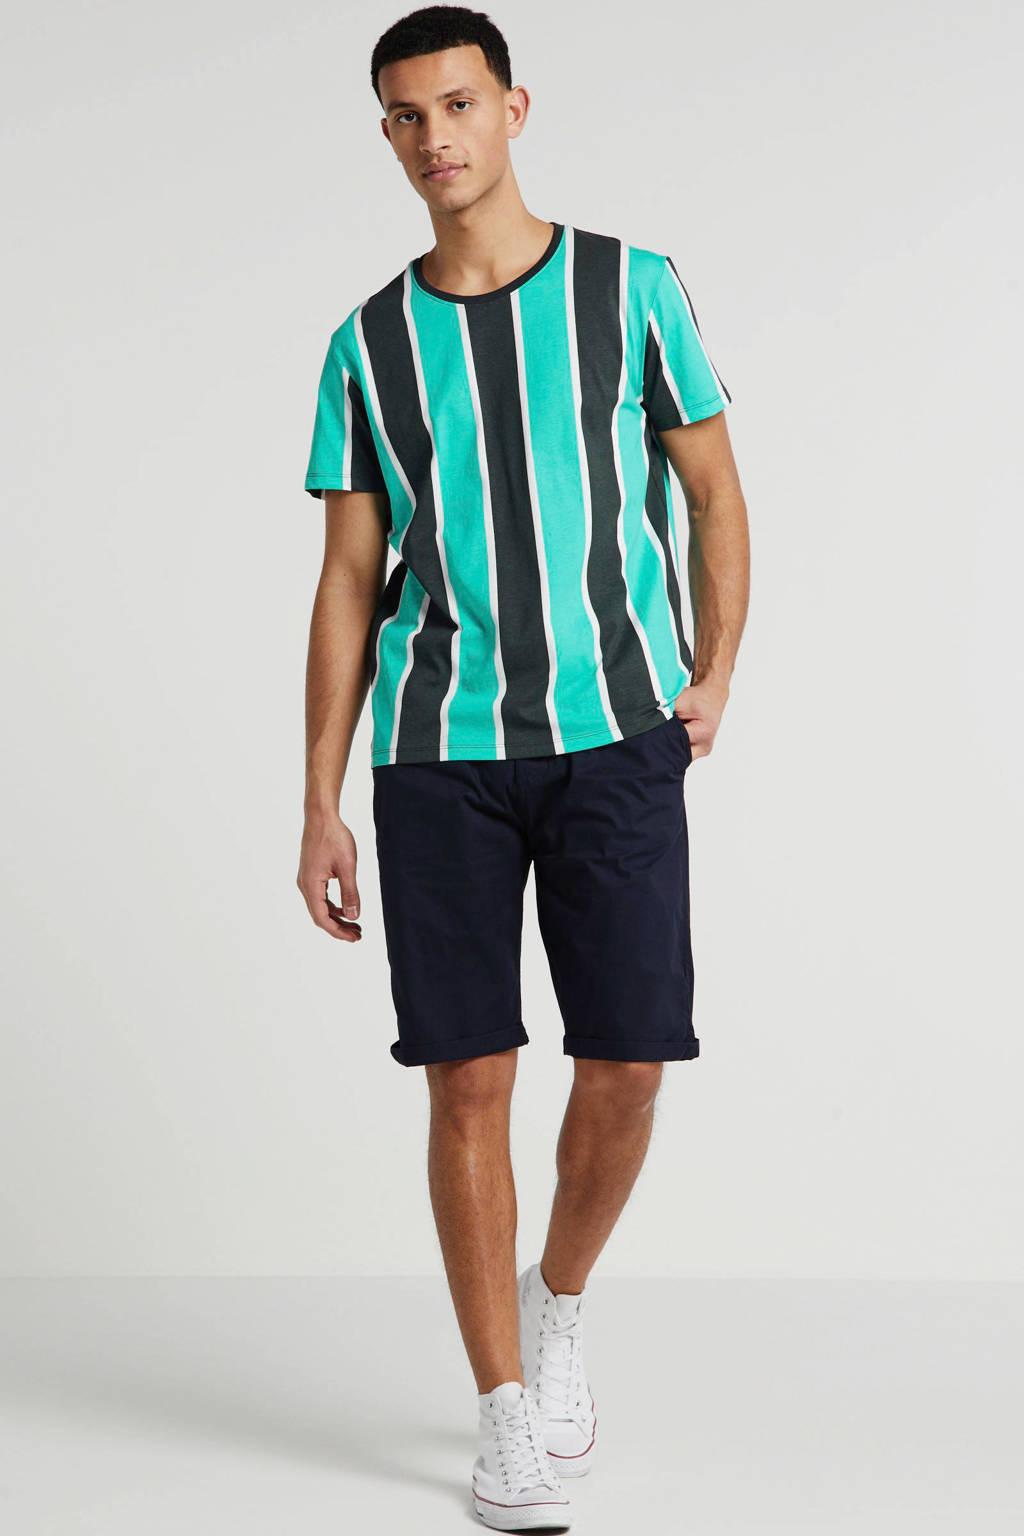 edc Men gestreept T-shirt groen, Groen